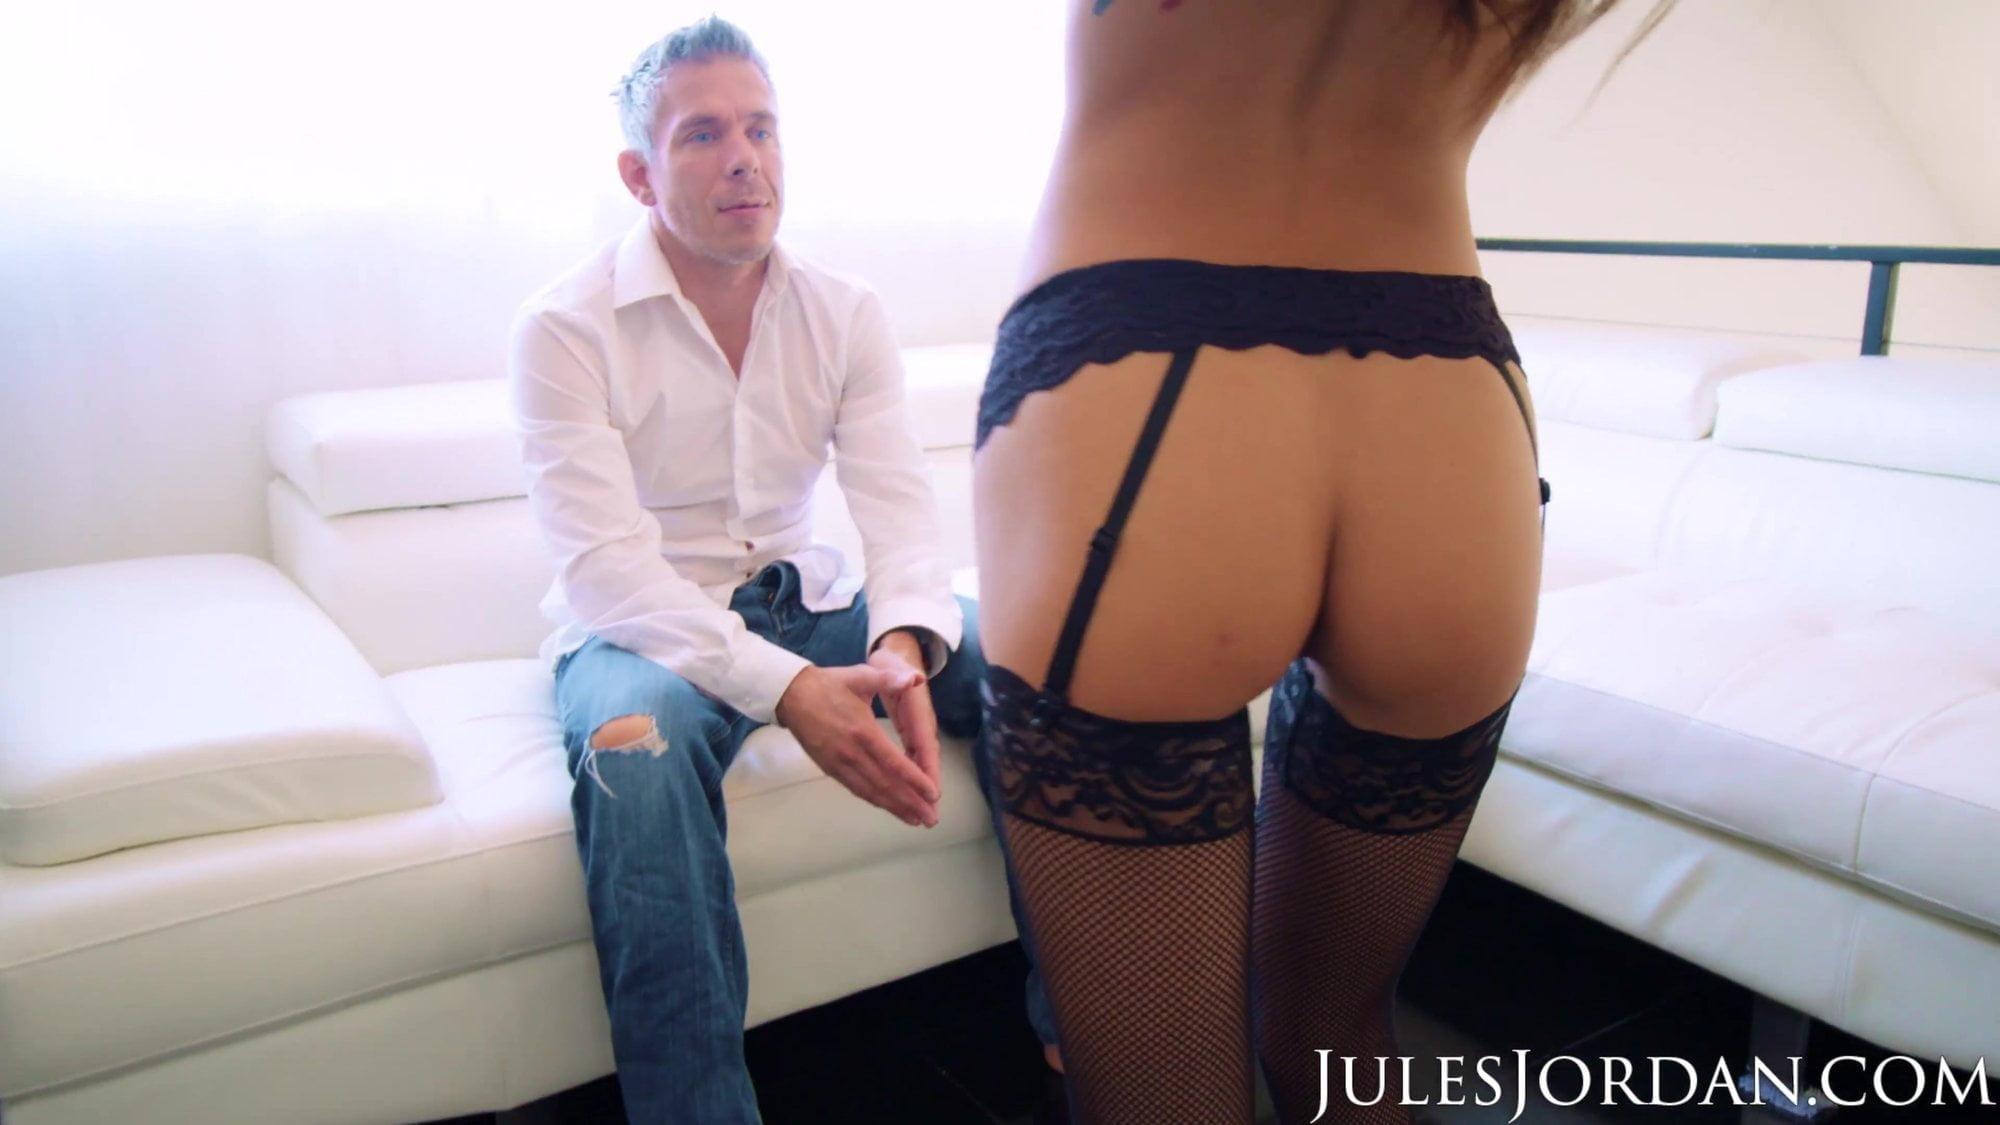 Jules Jordan – Teen Vina Sky is A Very Naughty Asian Slut